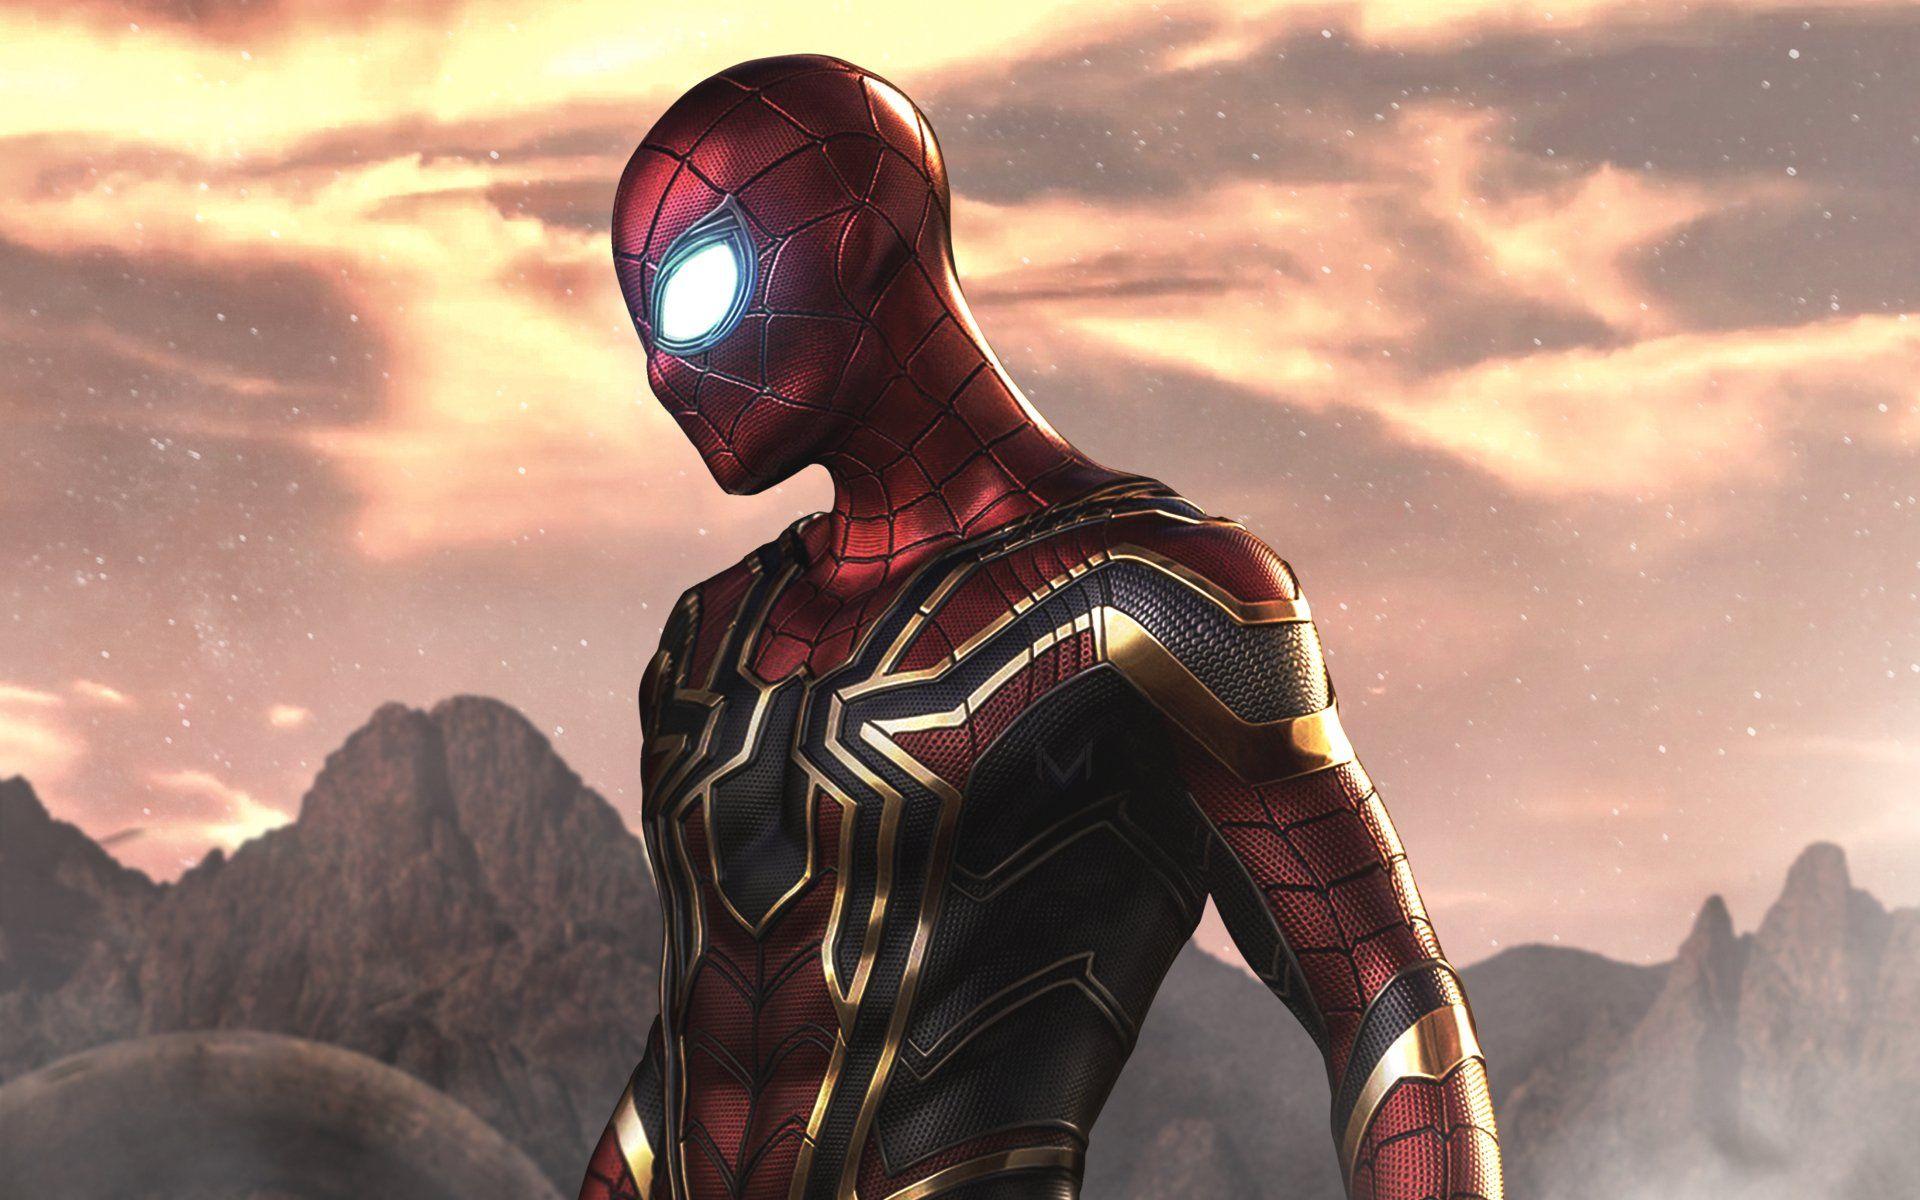 Movie Avengers Infinity War Marvel Comics Spider Man Iron Spider Wallpaper Marvel Wallpaper Spiderman Marvel Wallpaper Hd